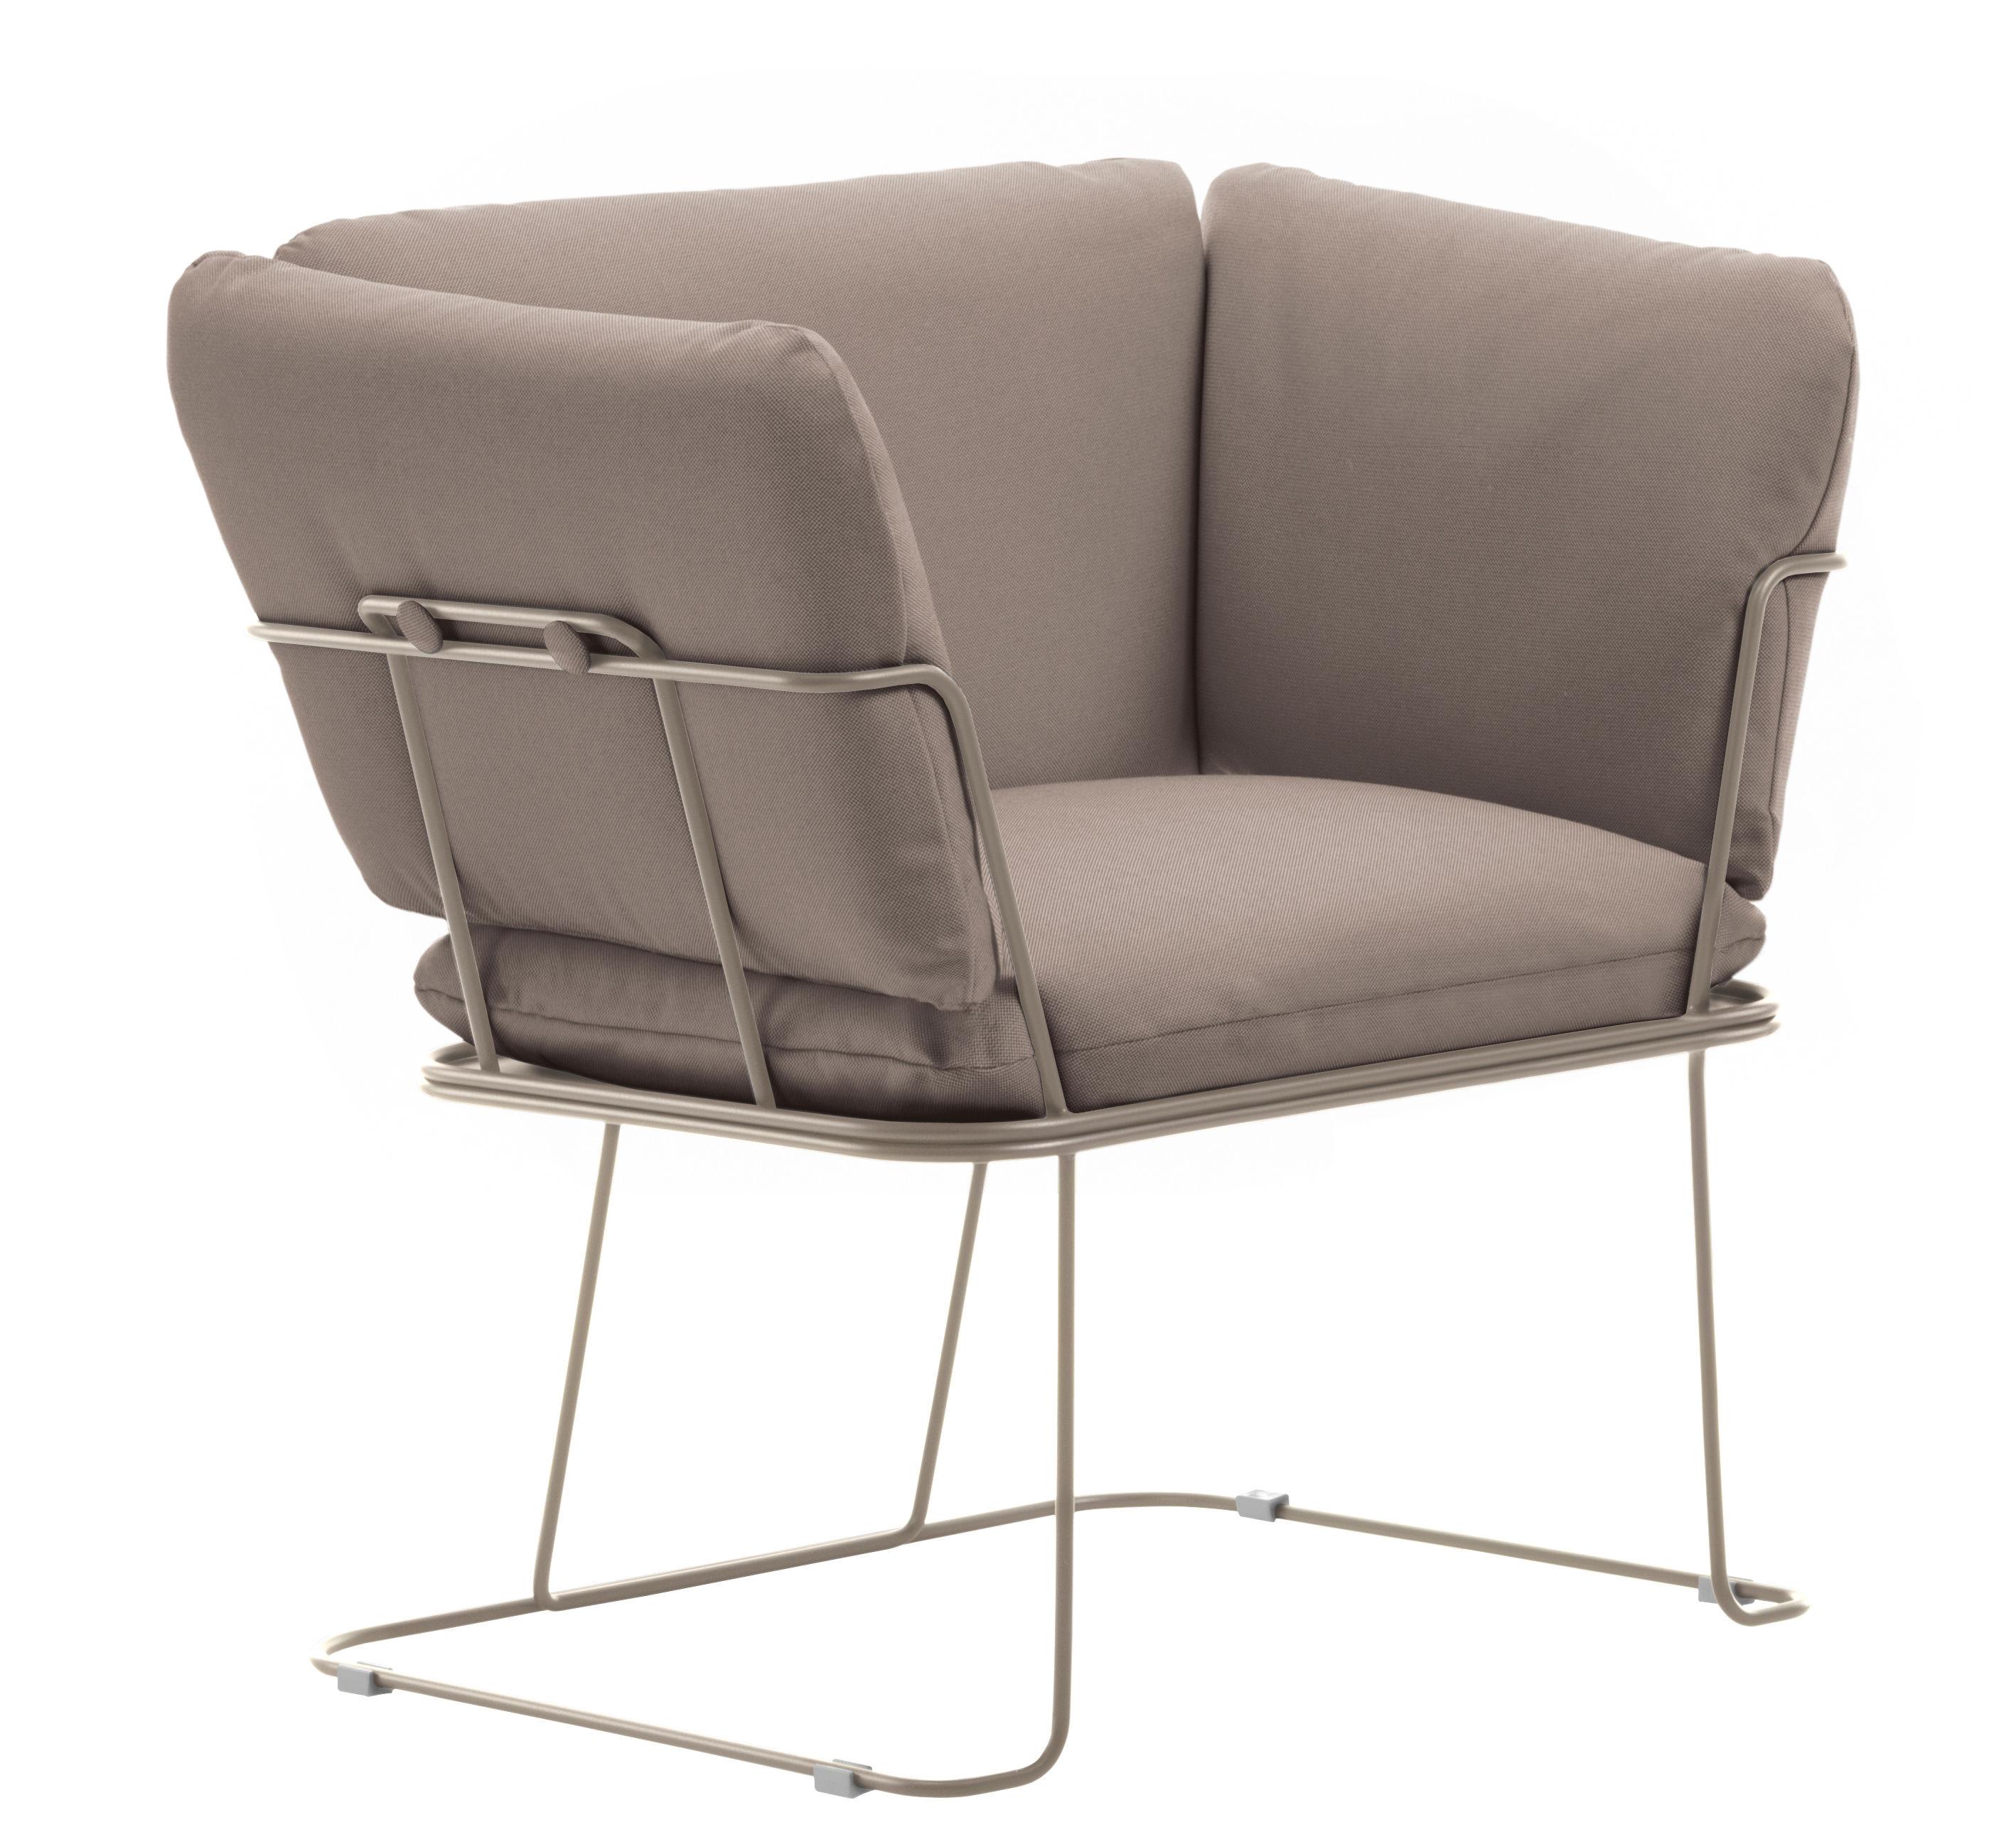 merano outdoor outdoorgeeignet stoff b line gepolsterter sessel. Black Bedroom Furniture Sets. Home Design Ideas